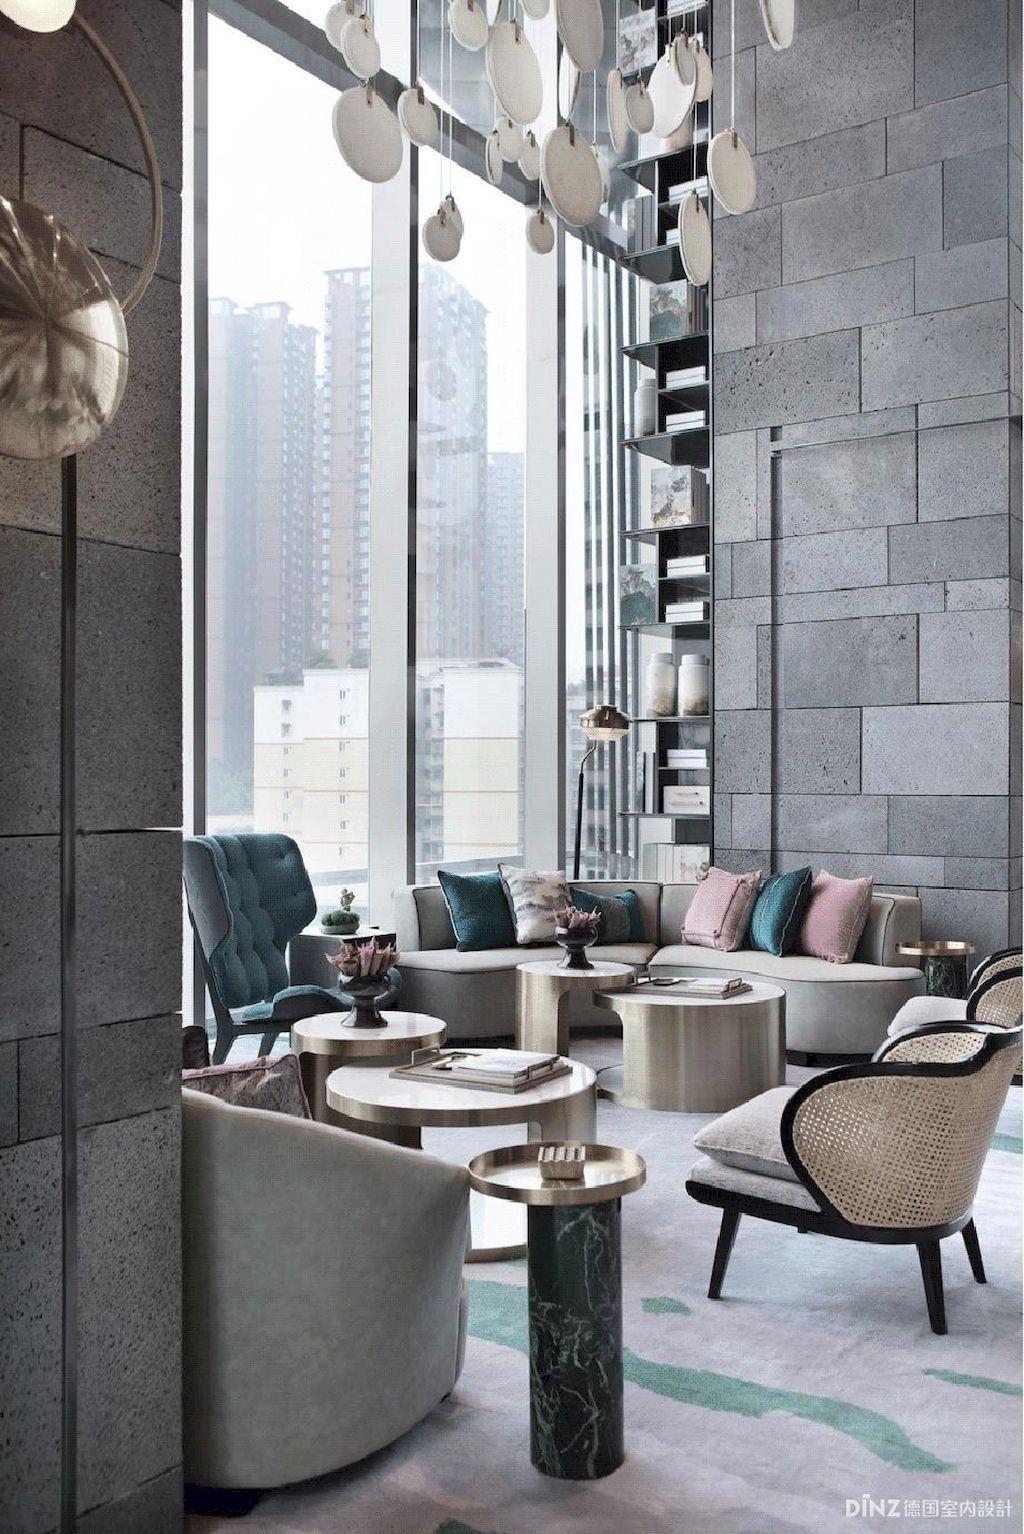 Luxurious Beautiful Scandinavian Interiors For Your Home Luxury Interior Hotel Interior Design Modern Interior Design